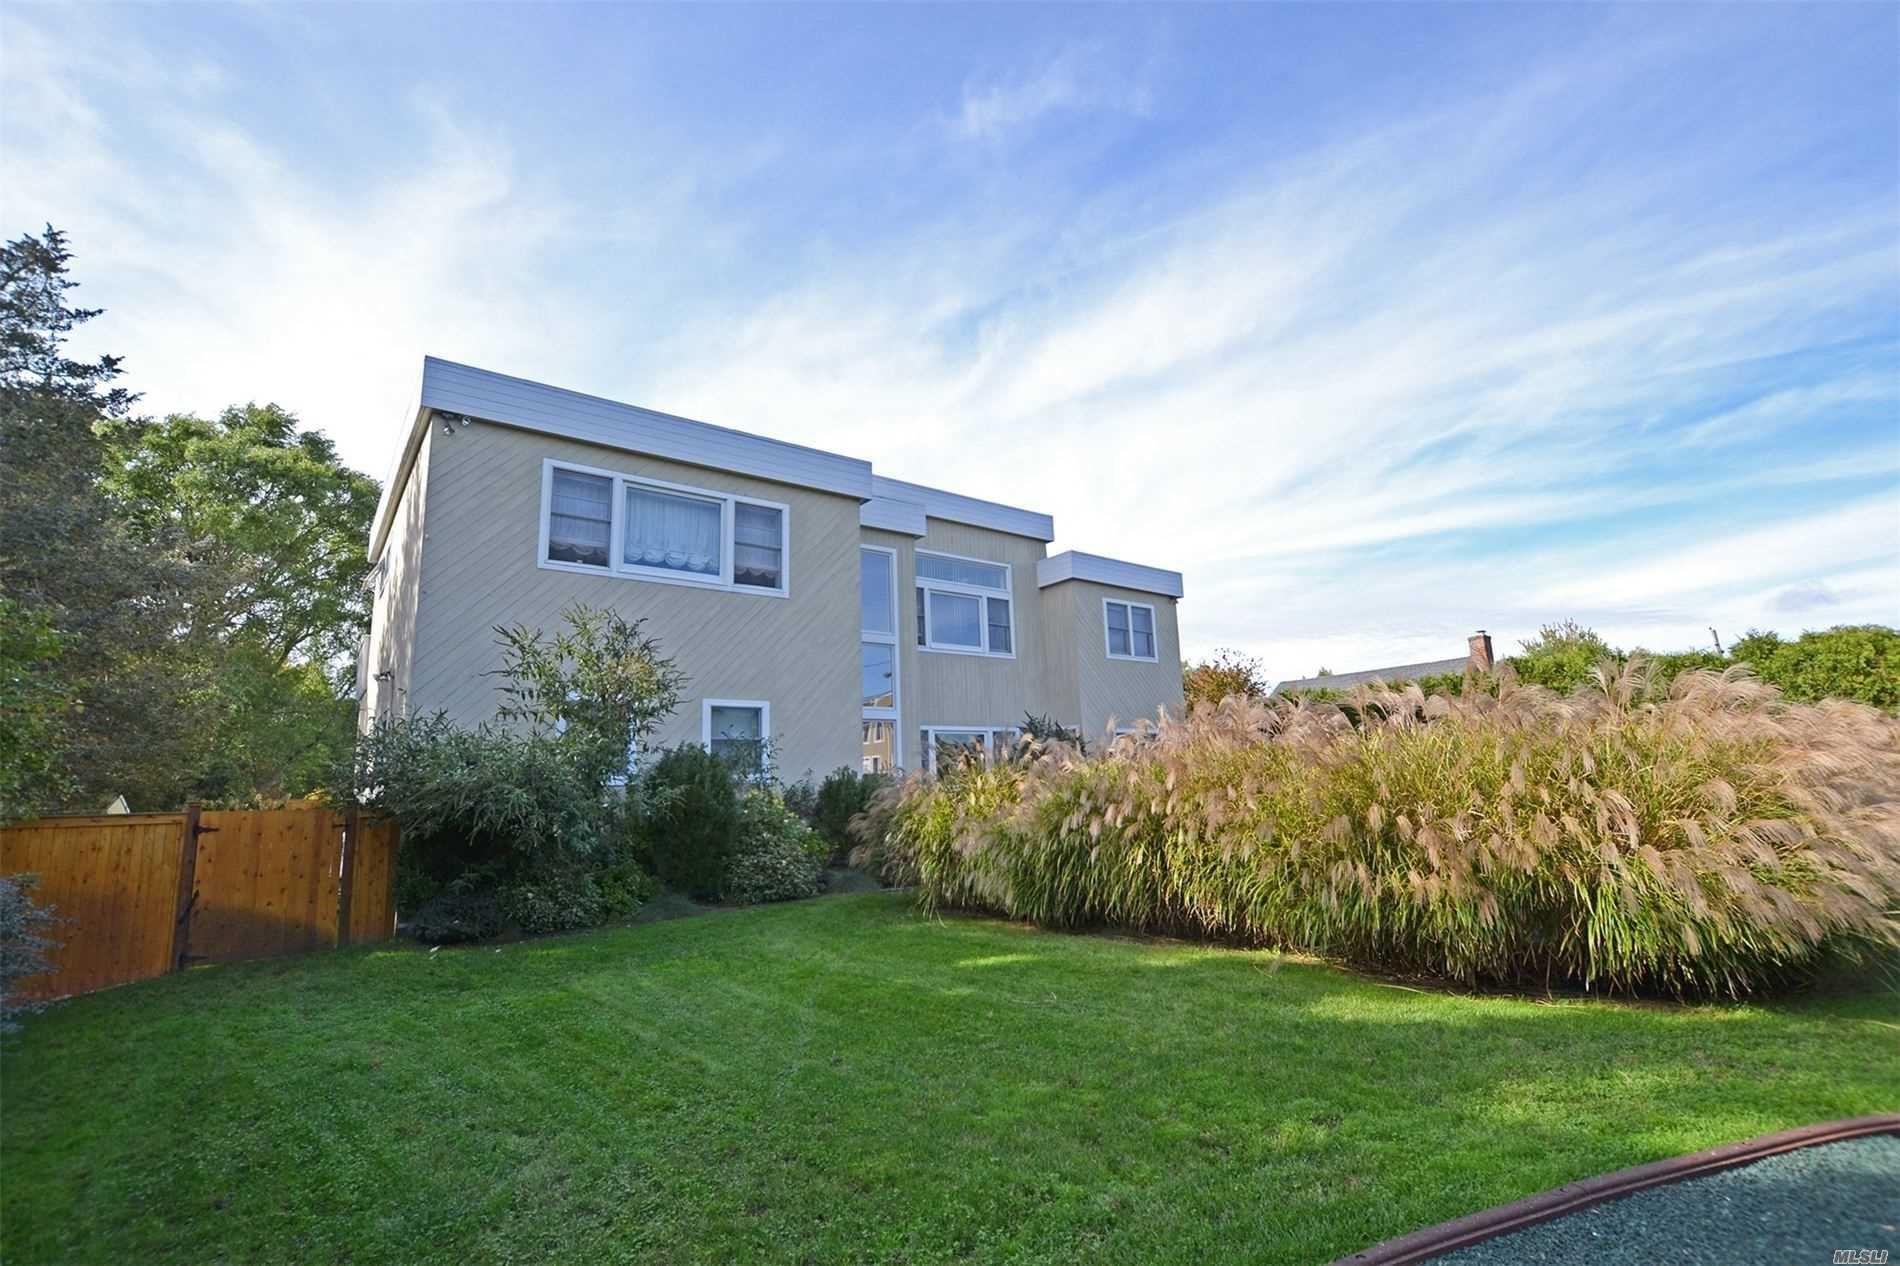 3 Shore Lane, Westhampton, NY 11977 - MLS#: 3200477